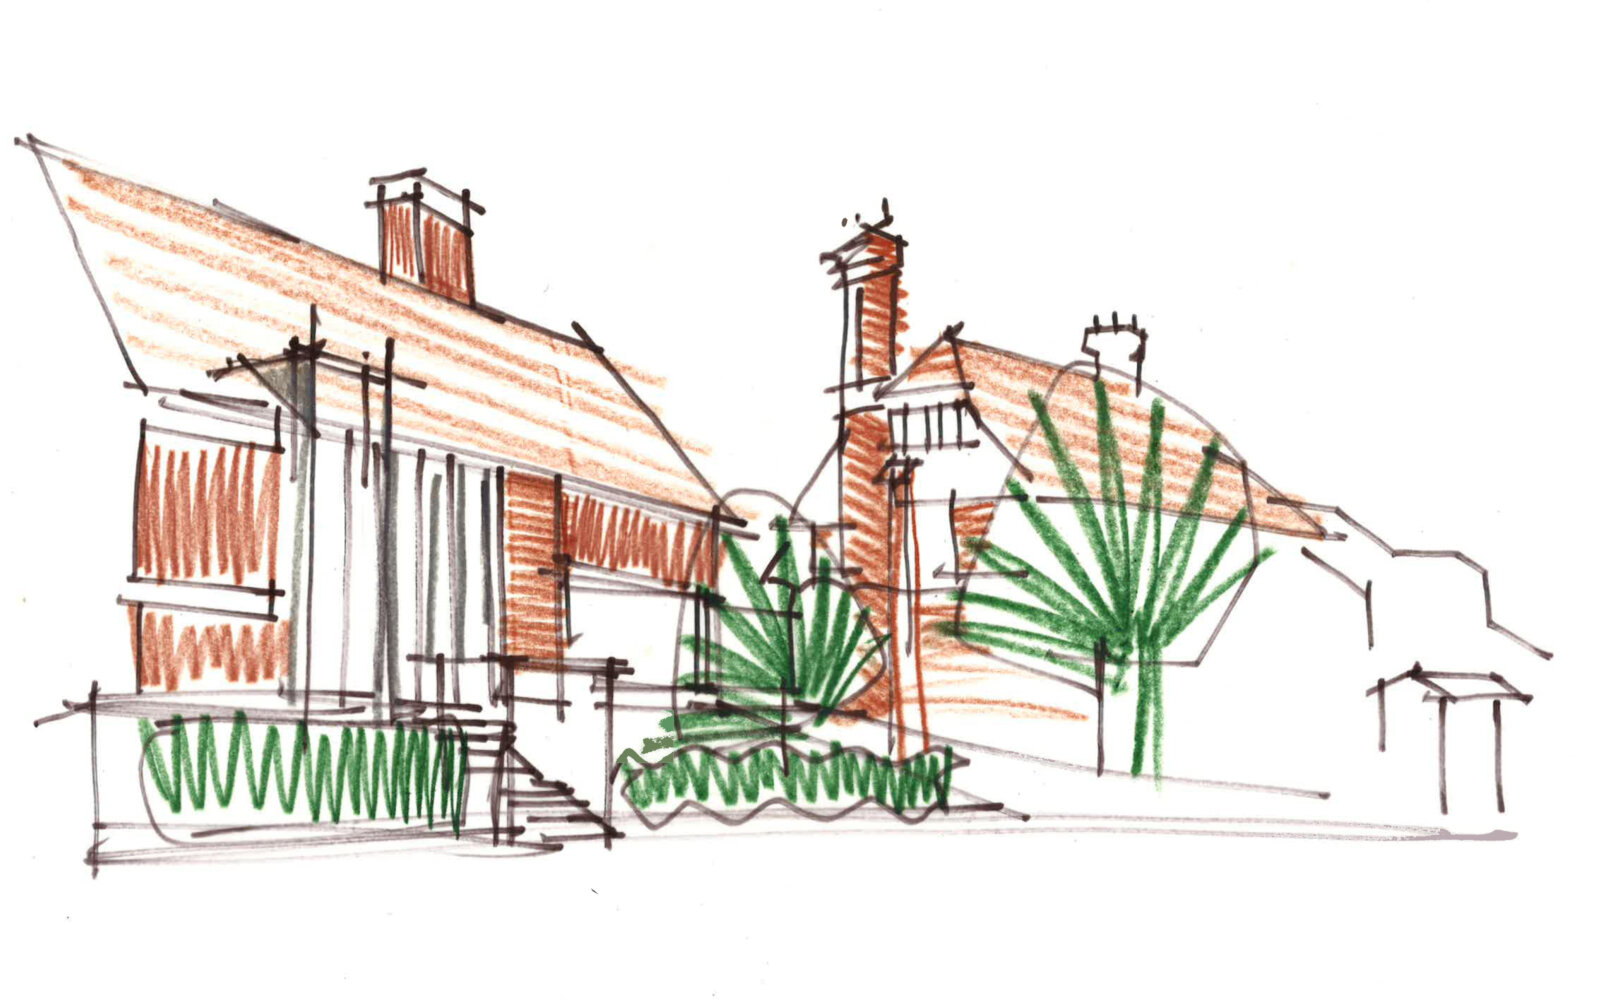 Private house concept sketch